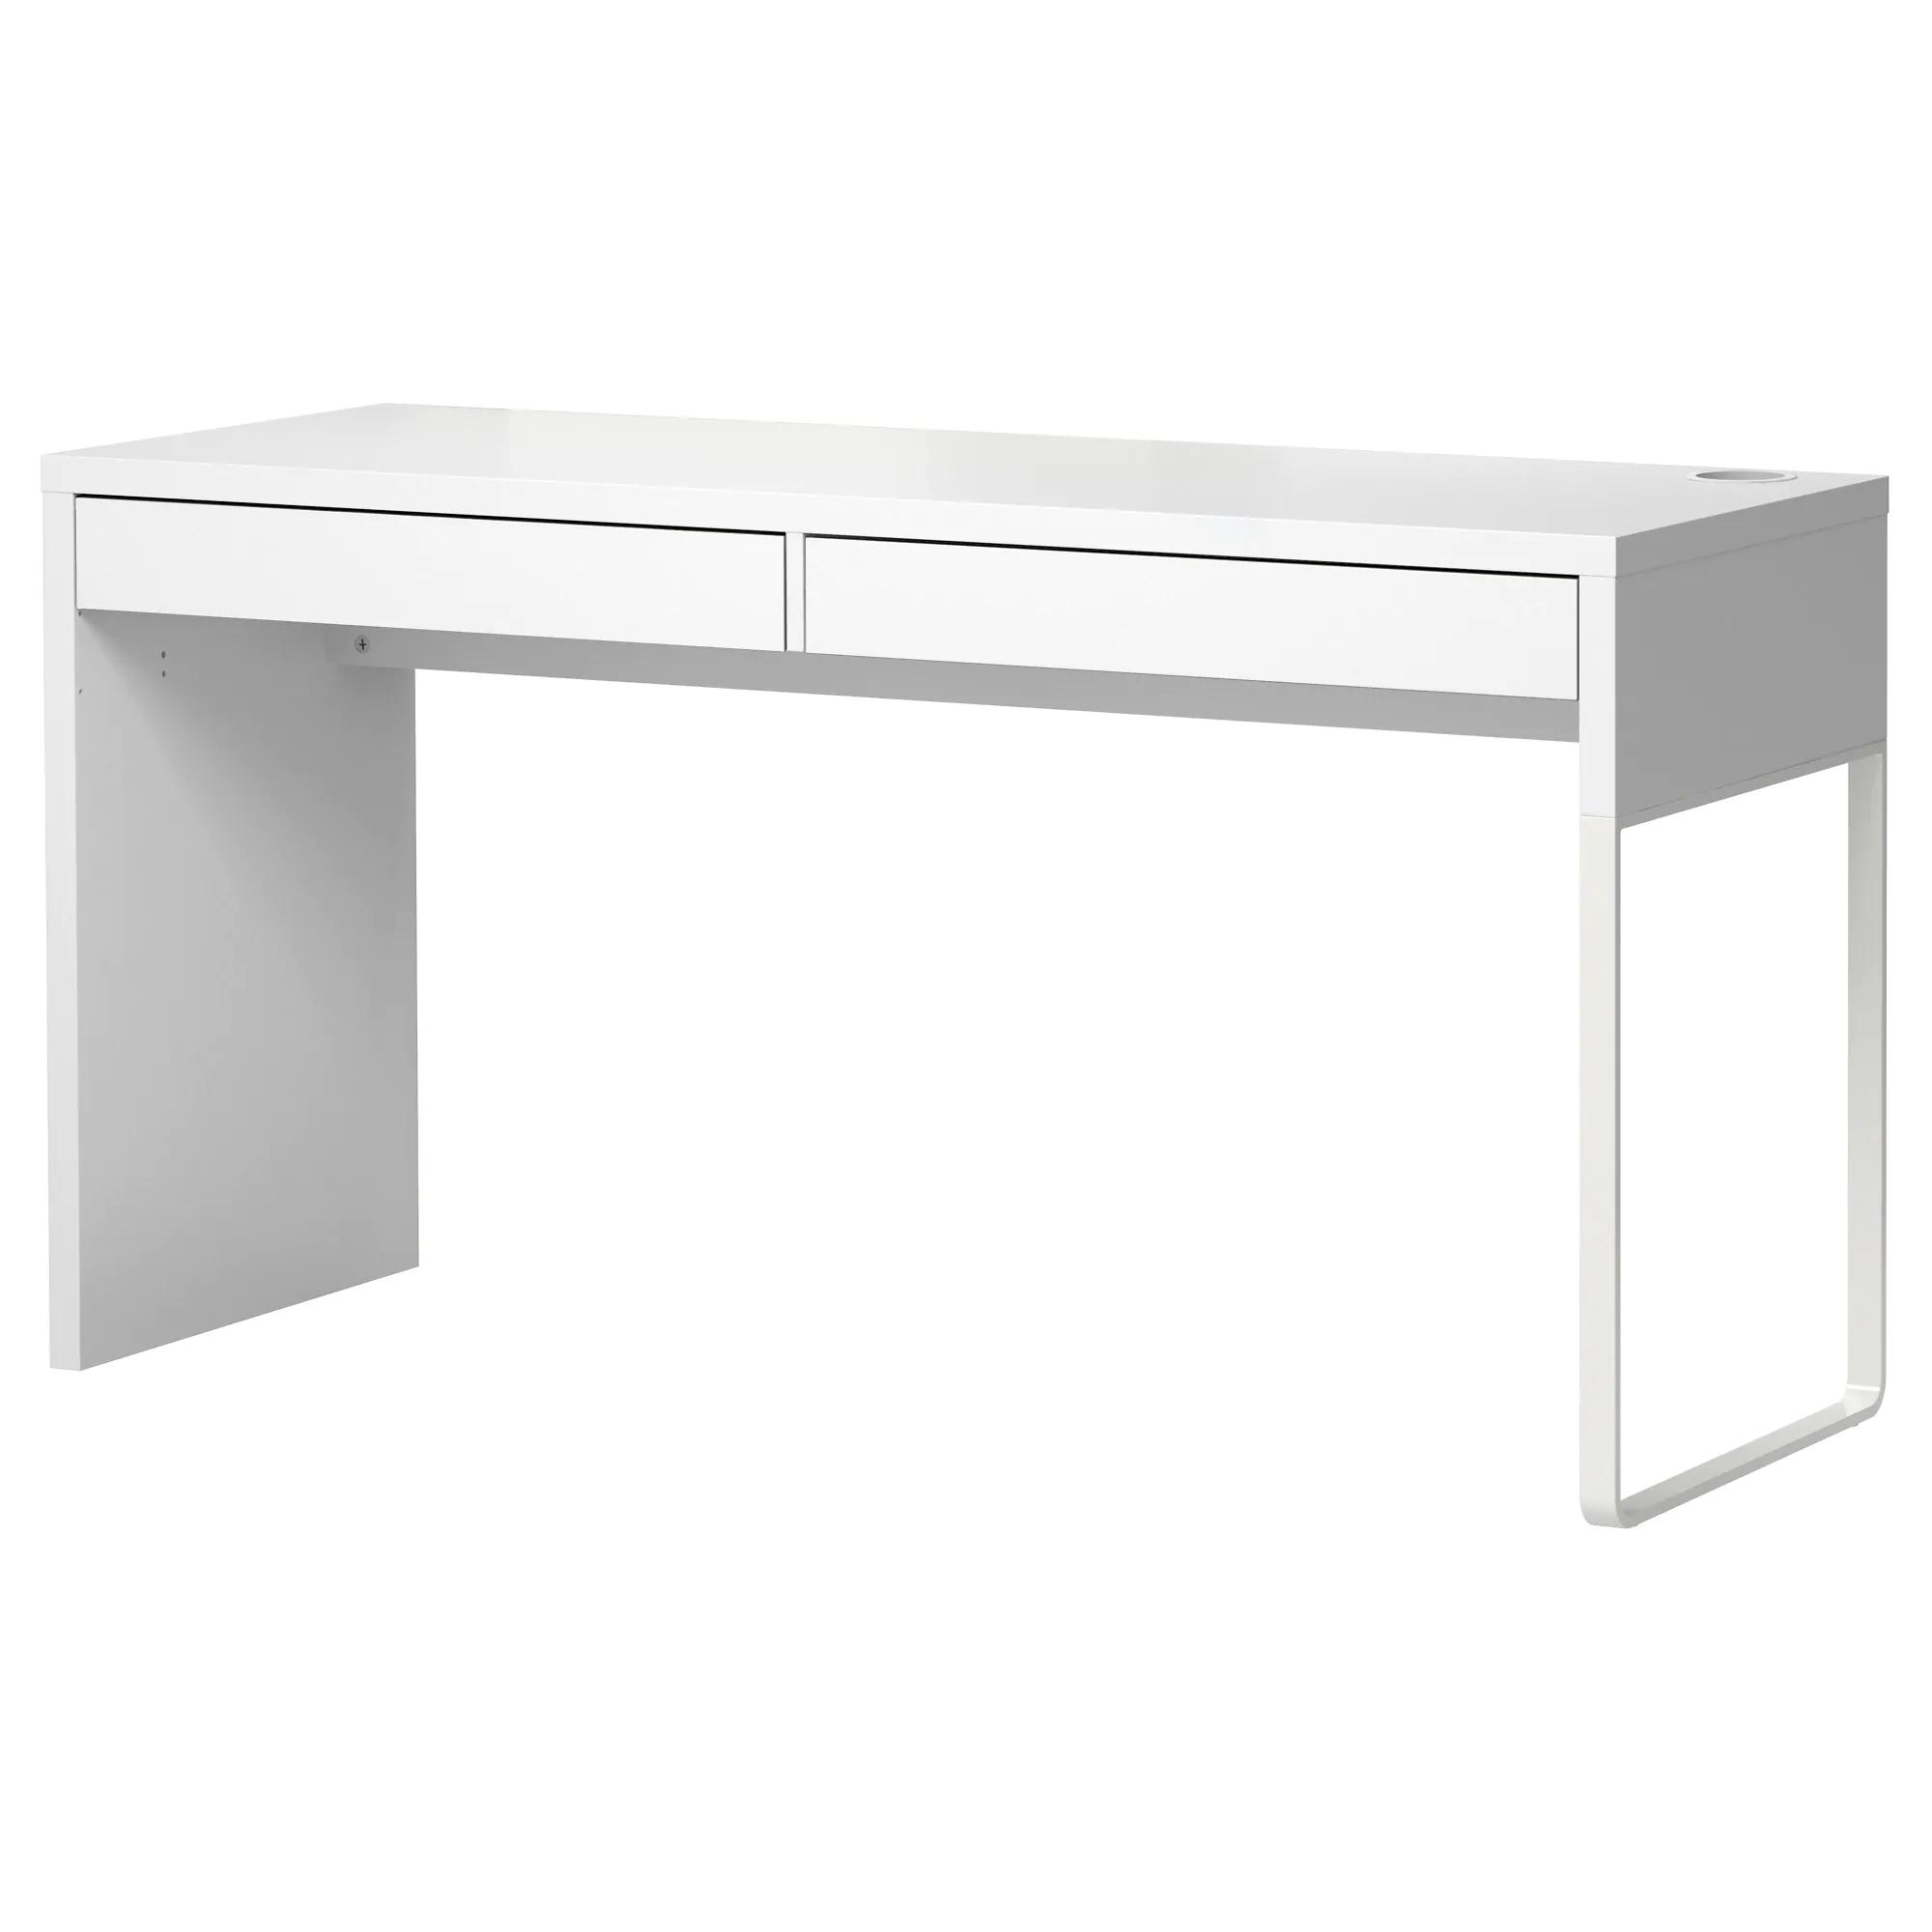 Micke Desk White 55 7 8x19 5 8 Ikea White Desk Office Micke Desk Ikea Desk